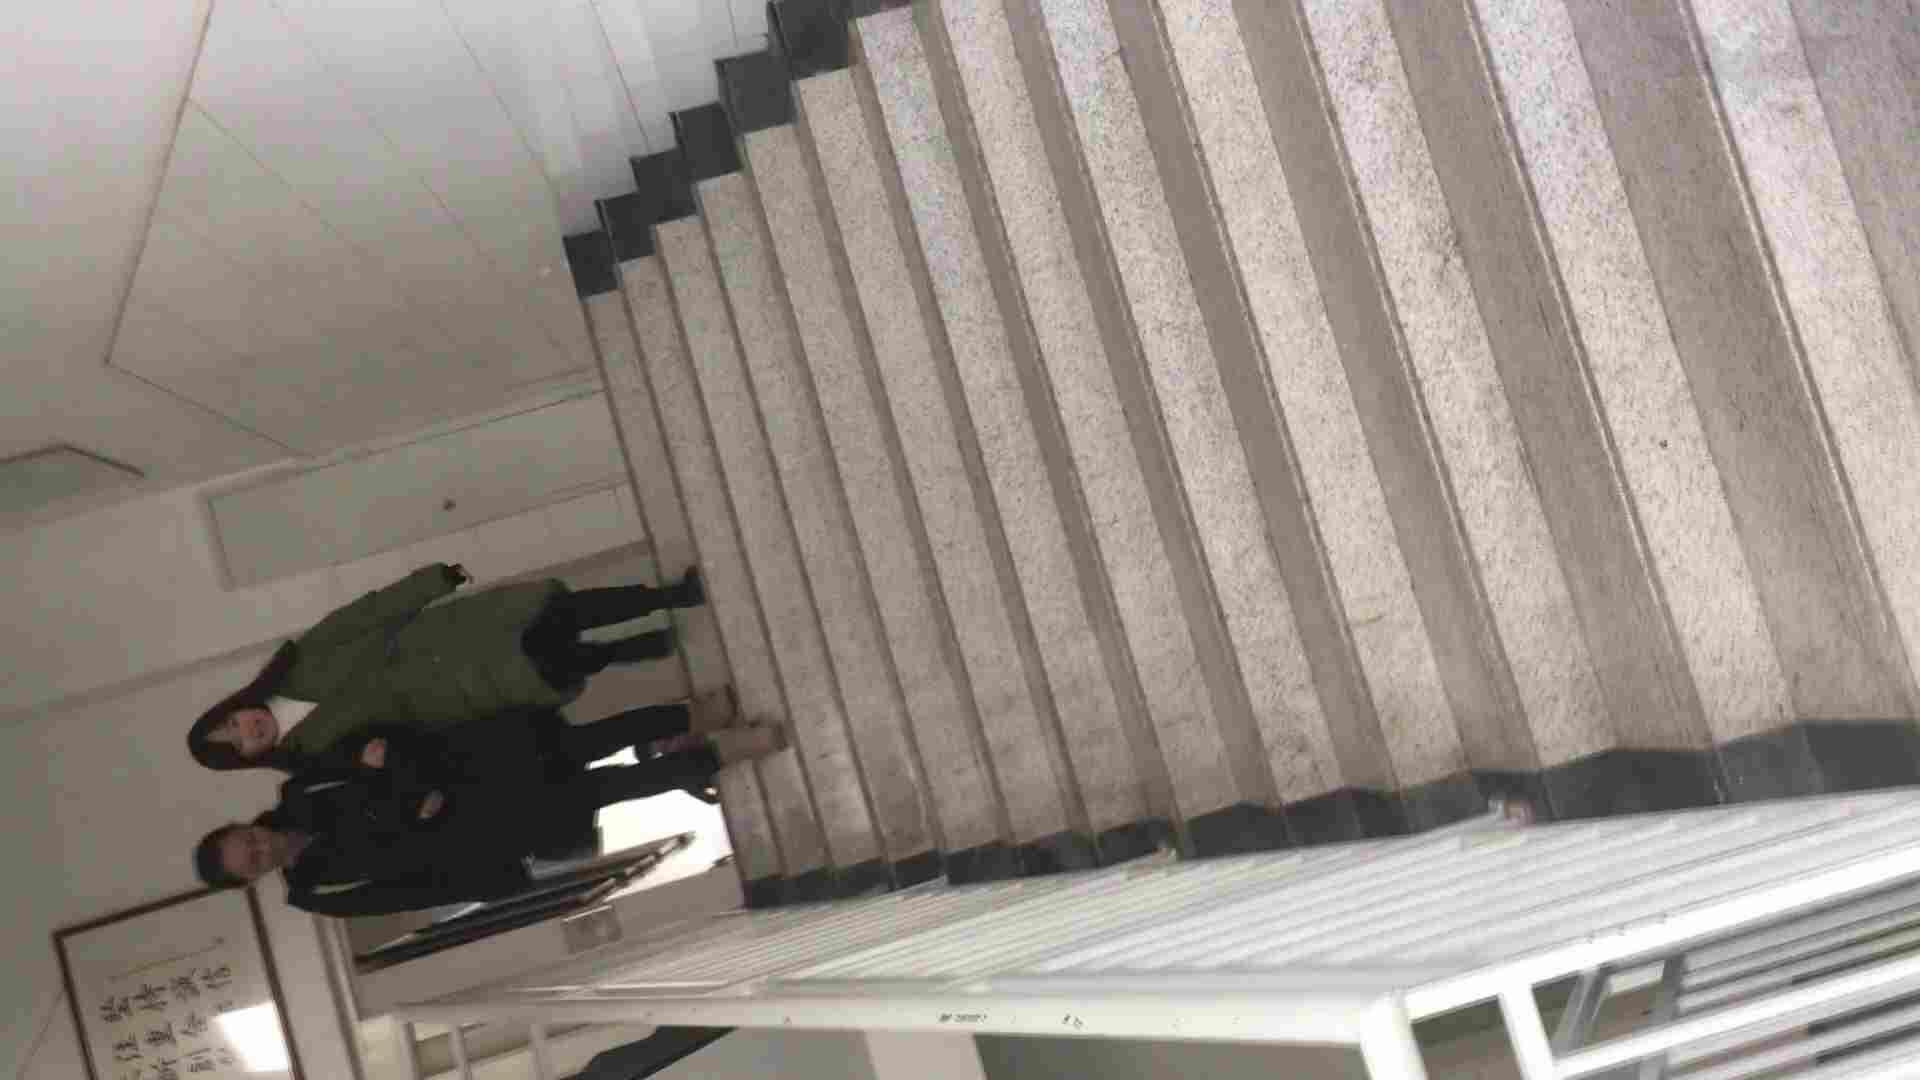 芸術大学ガチ潜入盗sati JD盗撮 美女の洗面所の秘密 Vol.95 潜入 盗撮オメコ無修正動画無料 72pic 47